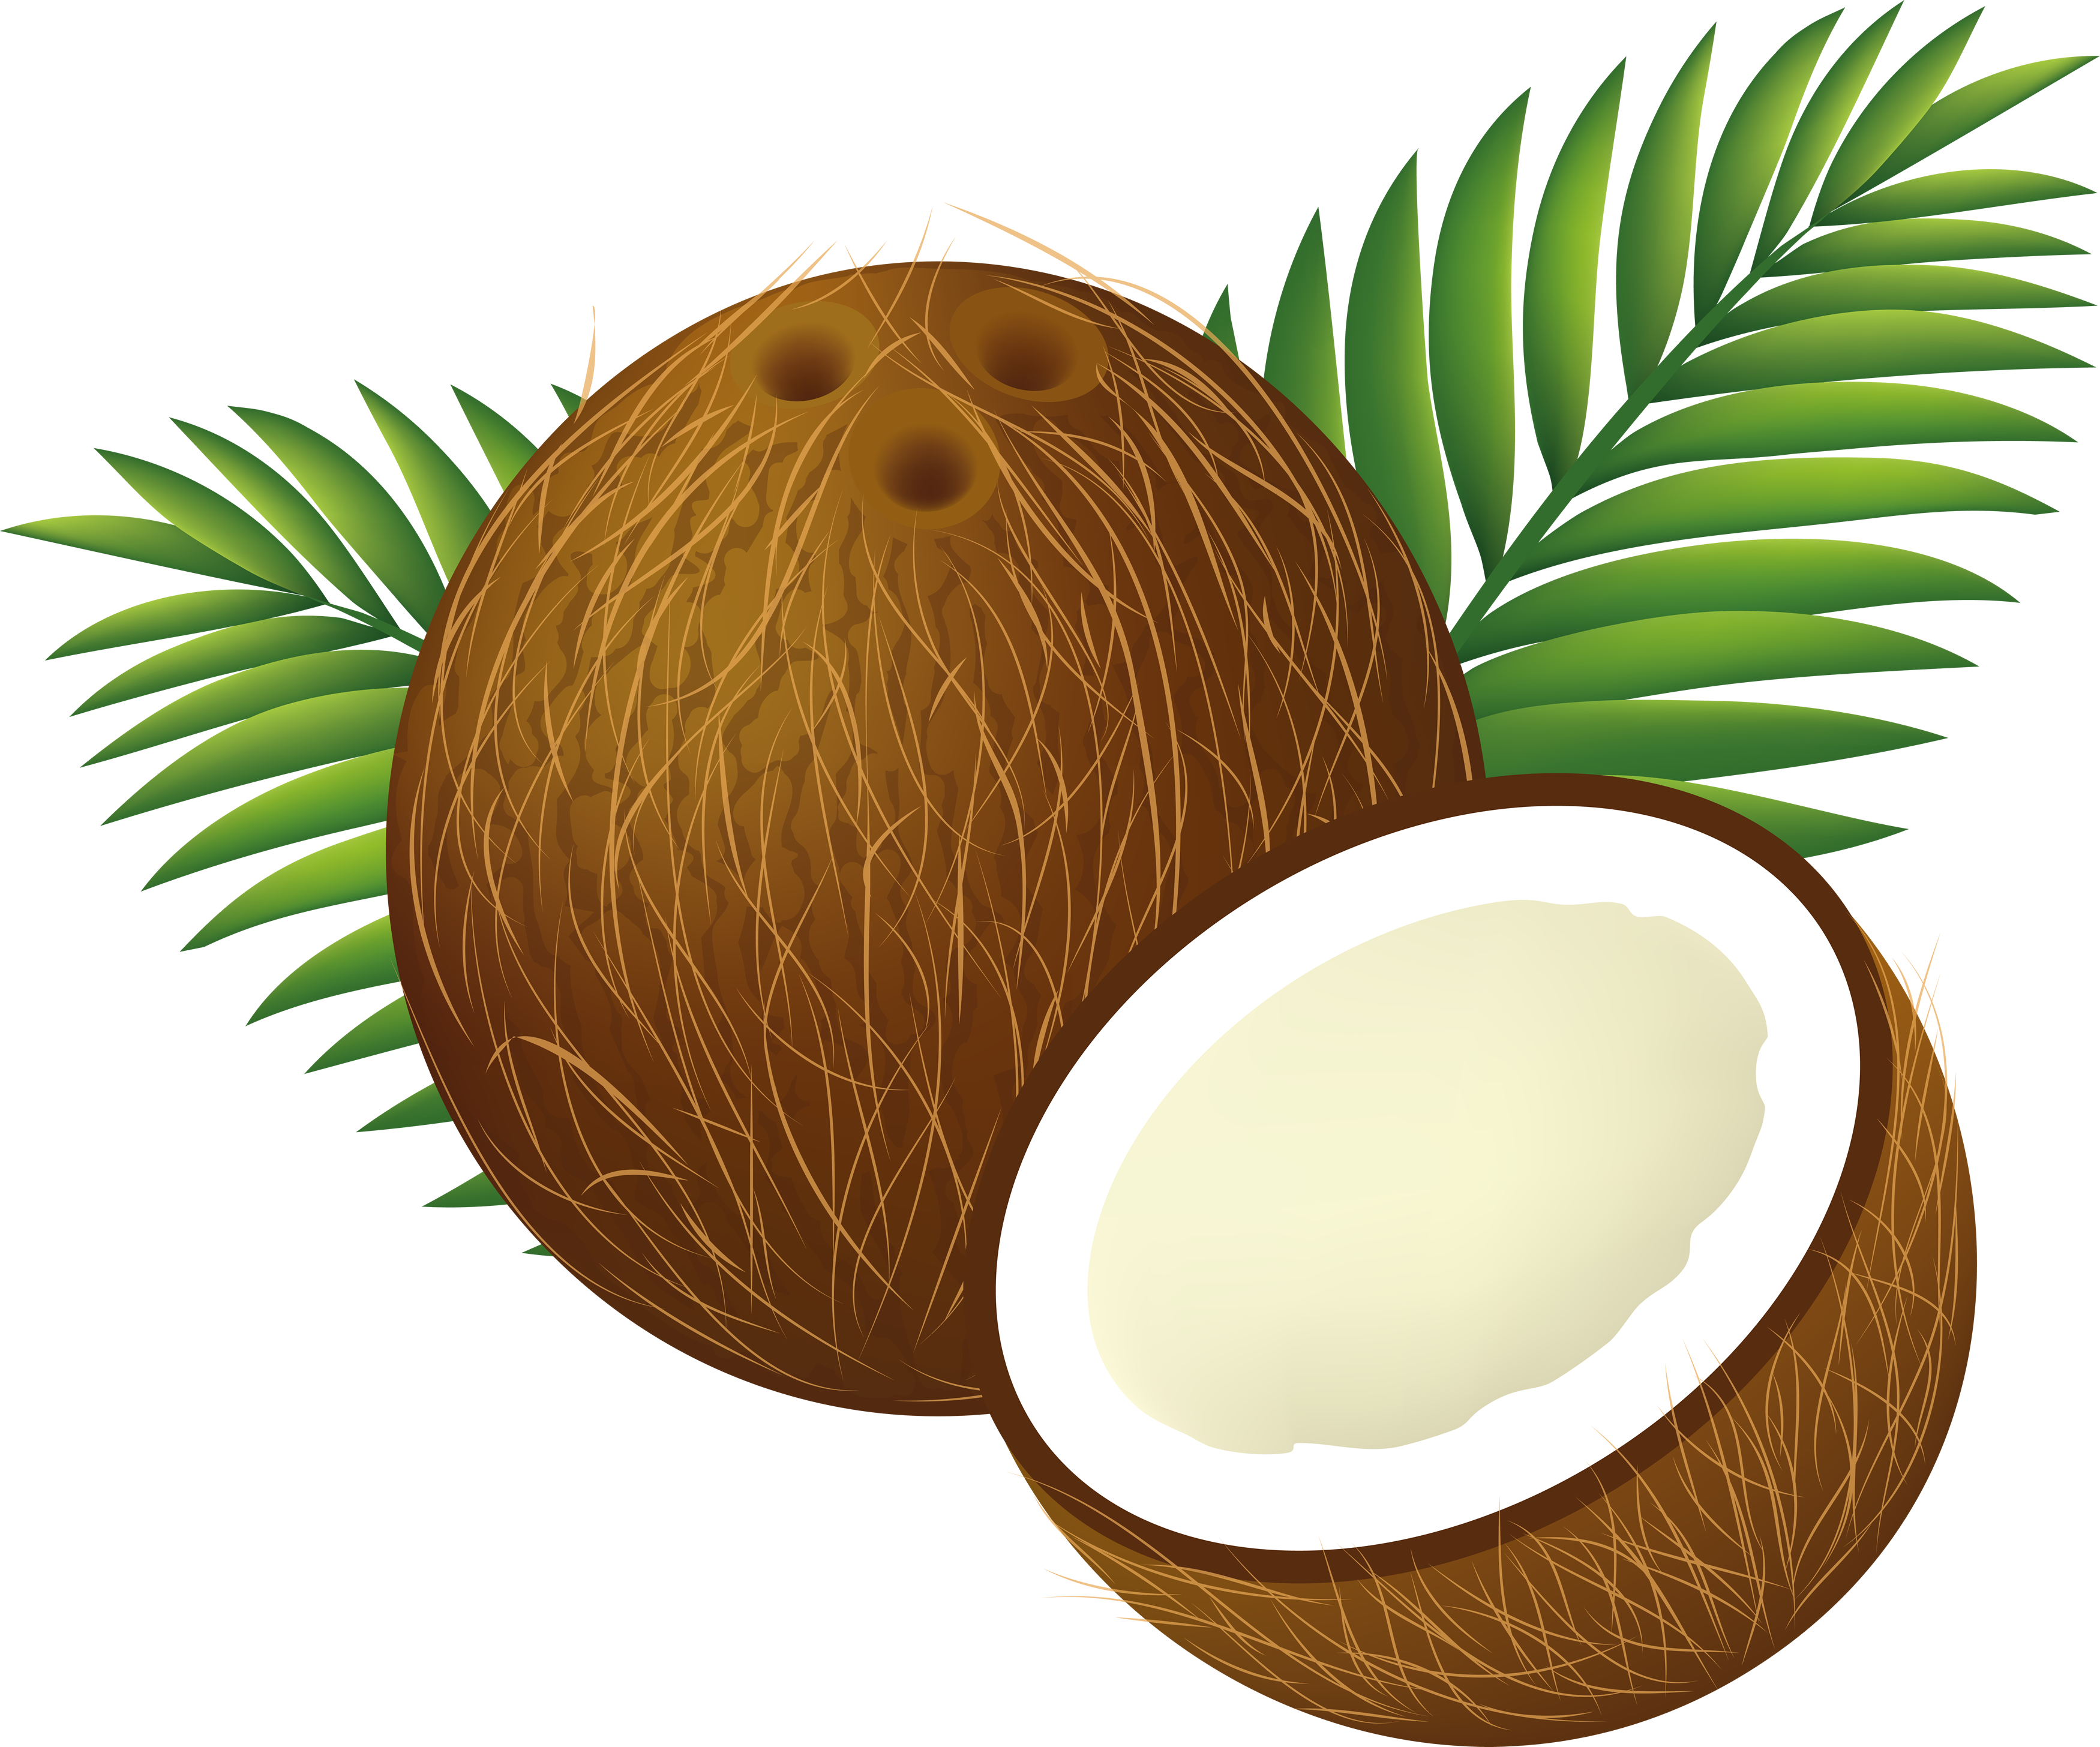 Oil clipart peanut oil. Coconut nariyal free on